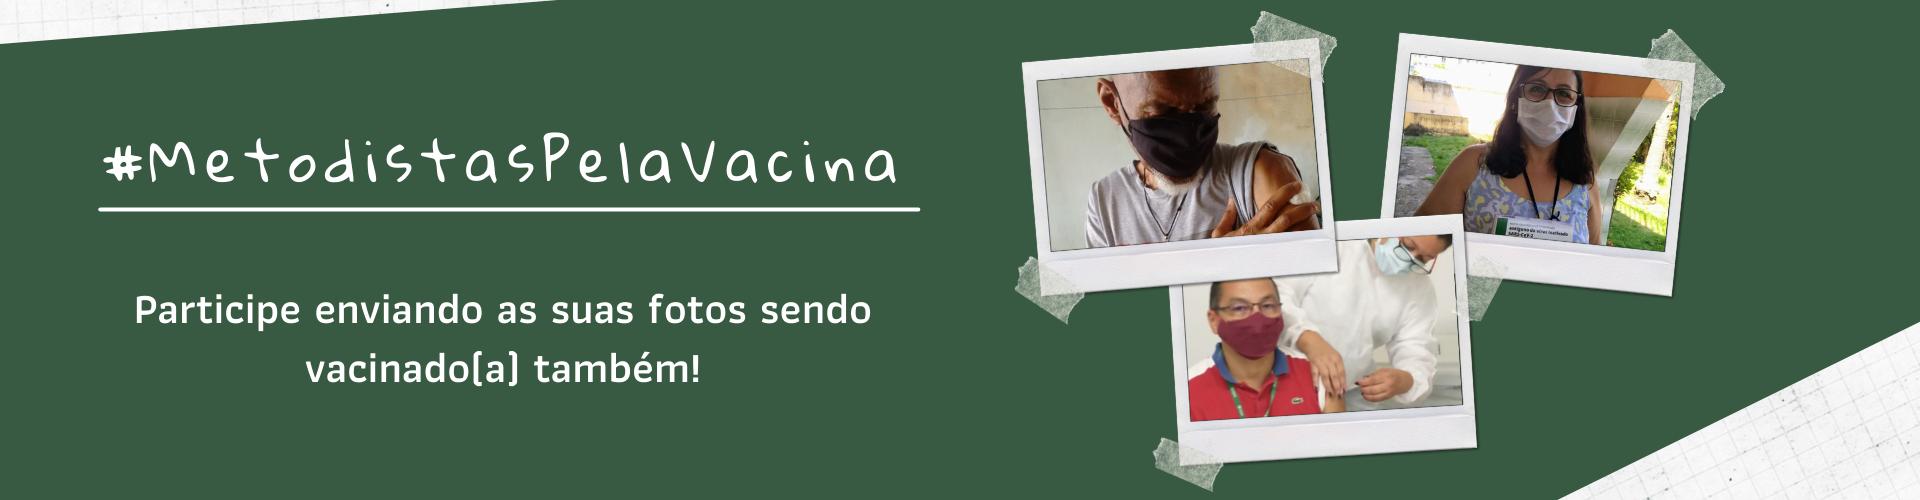 Metodistas Pela Vacina #MetodistasPelaVacina